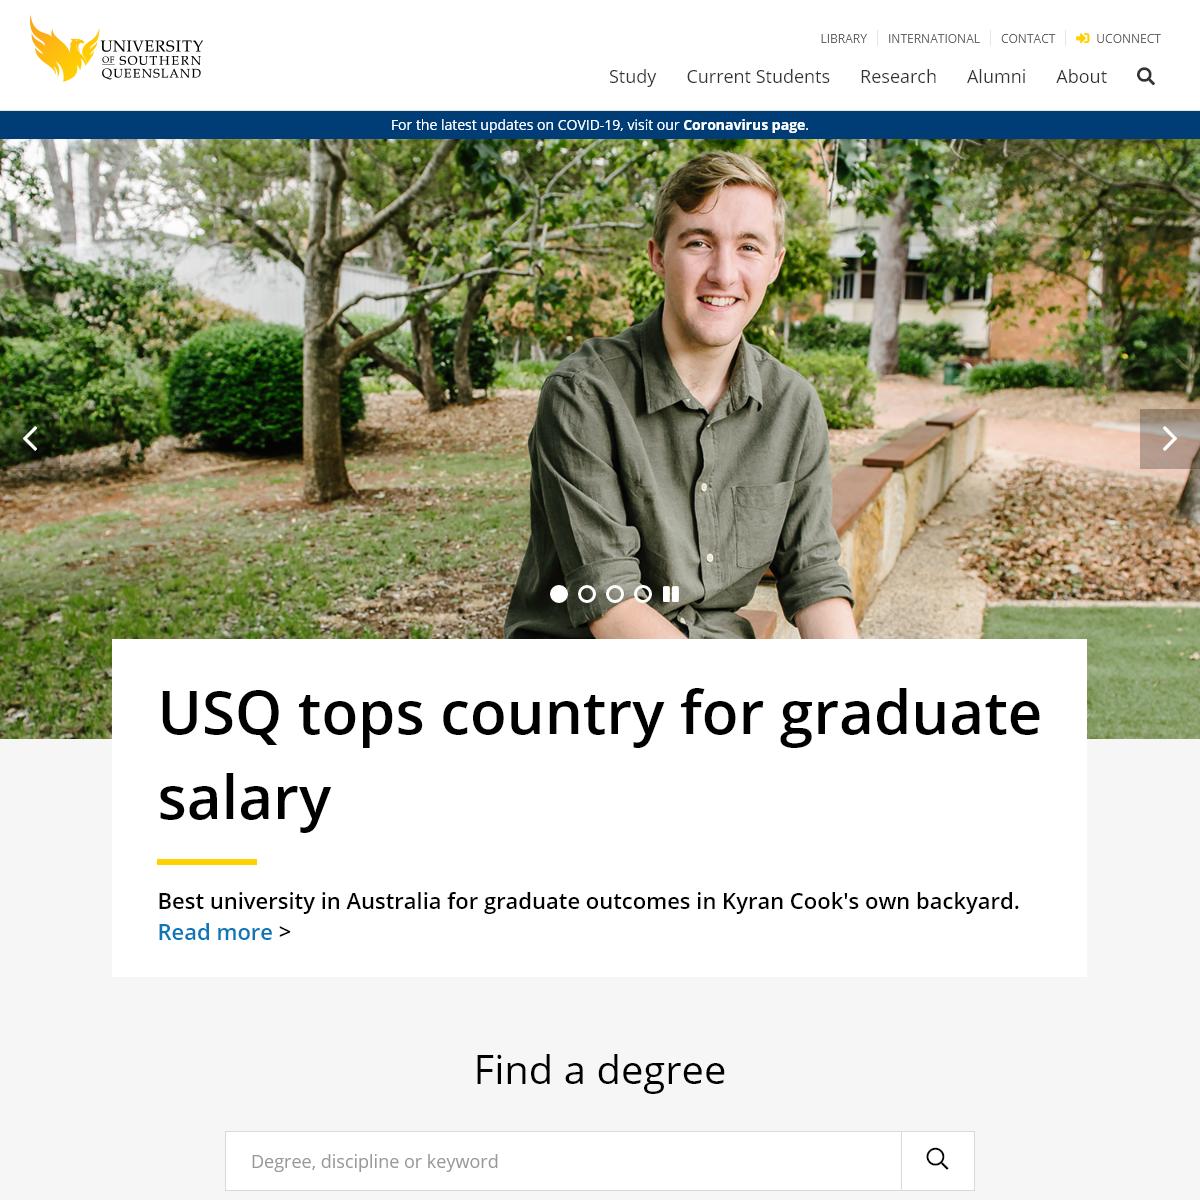 University of Southern Queensland - University of Southern Queensland